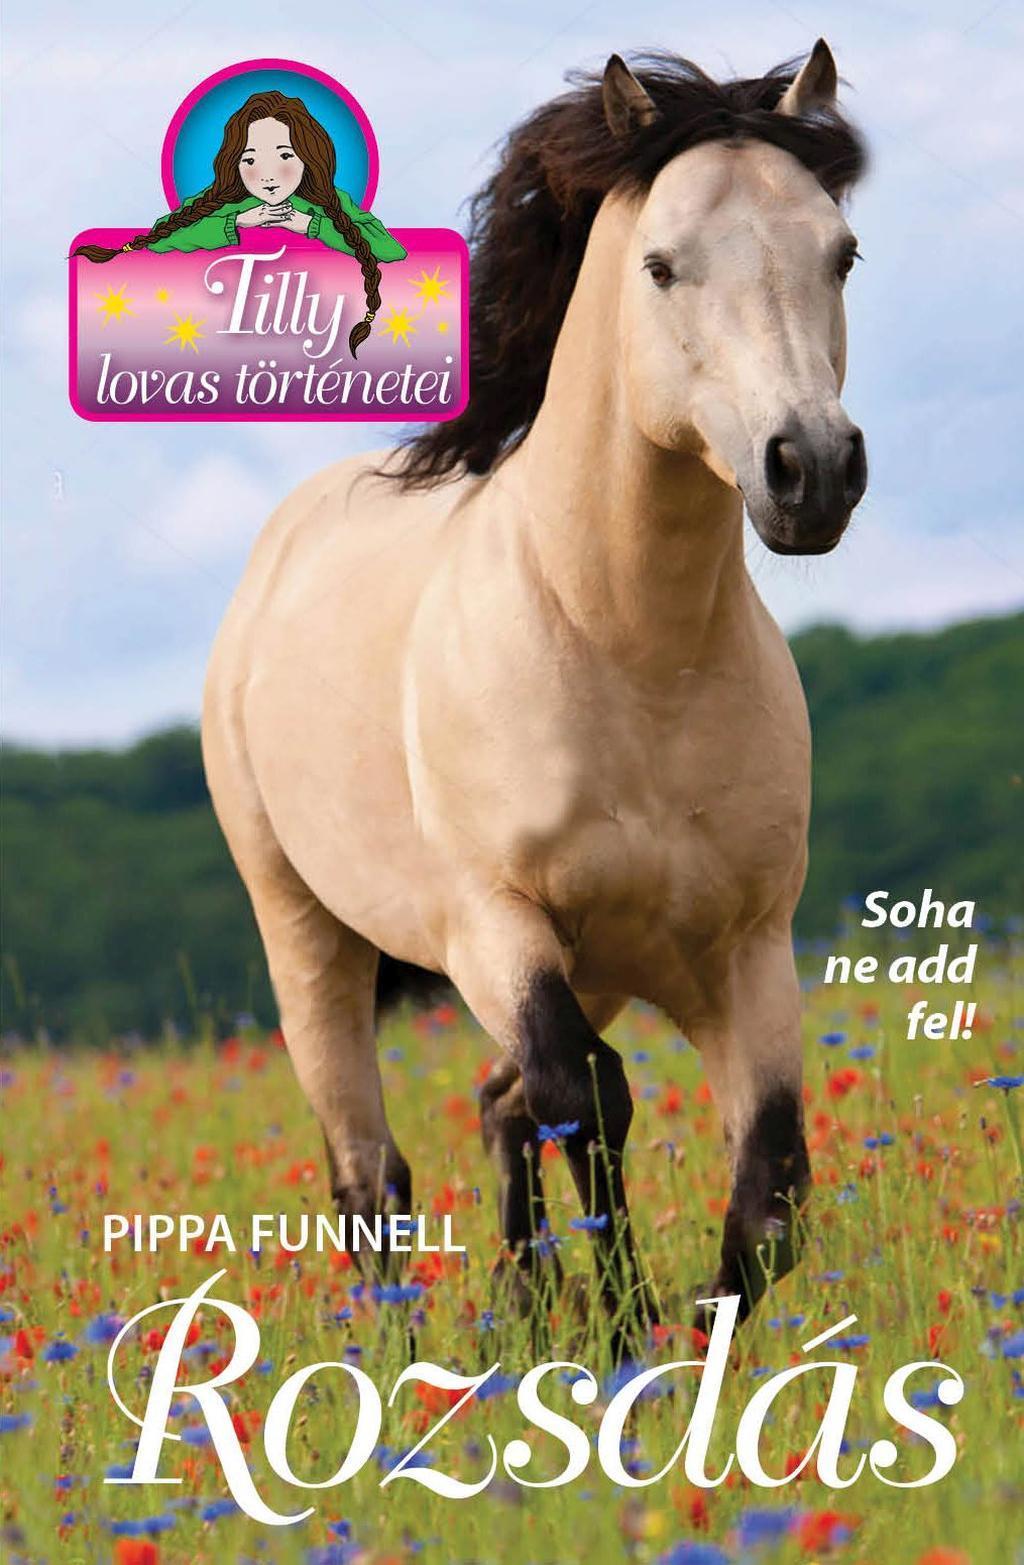 Pippa Funnel - Tilly lovas történetei 15. - Rozsdás